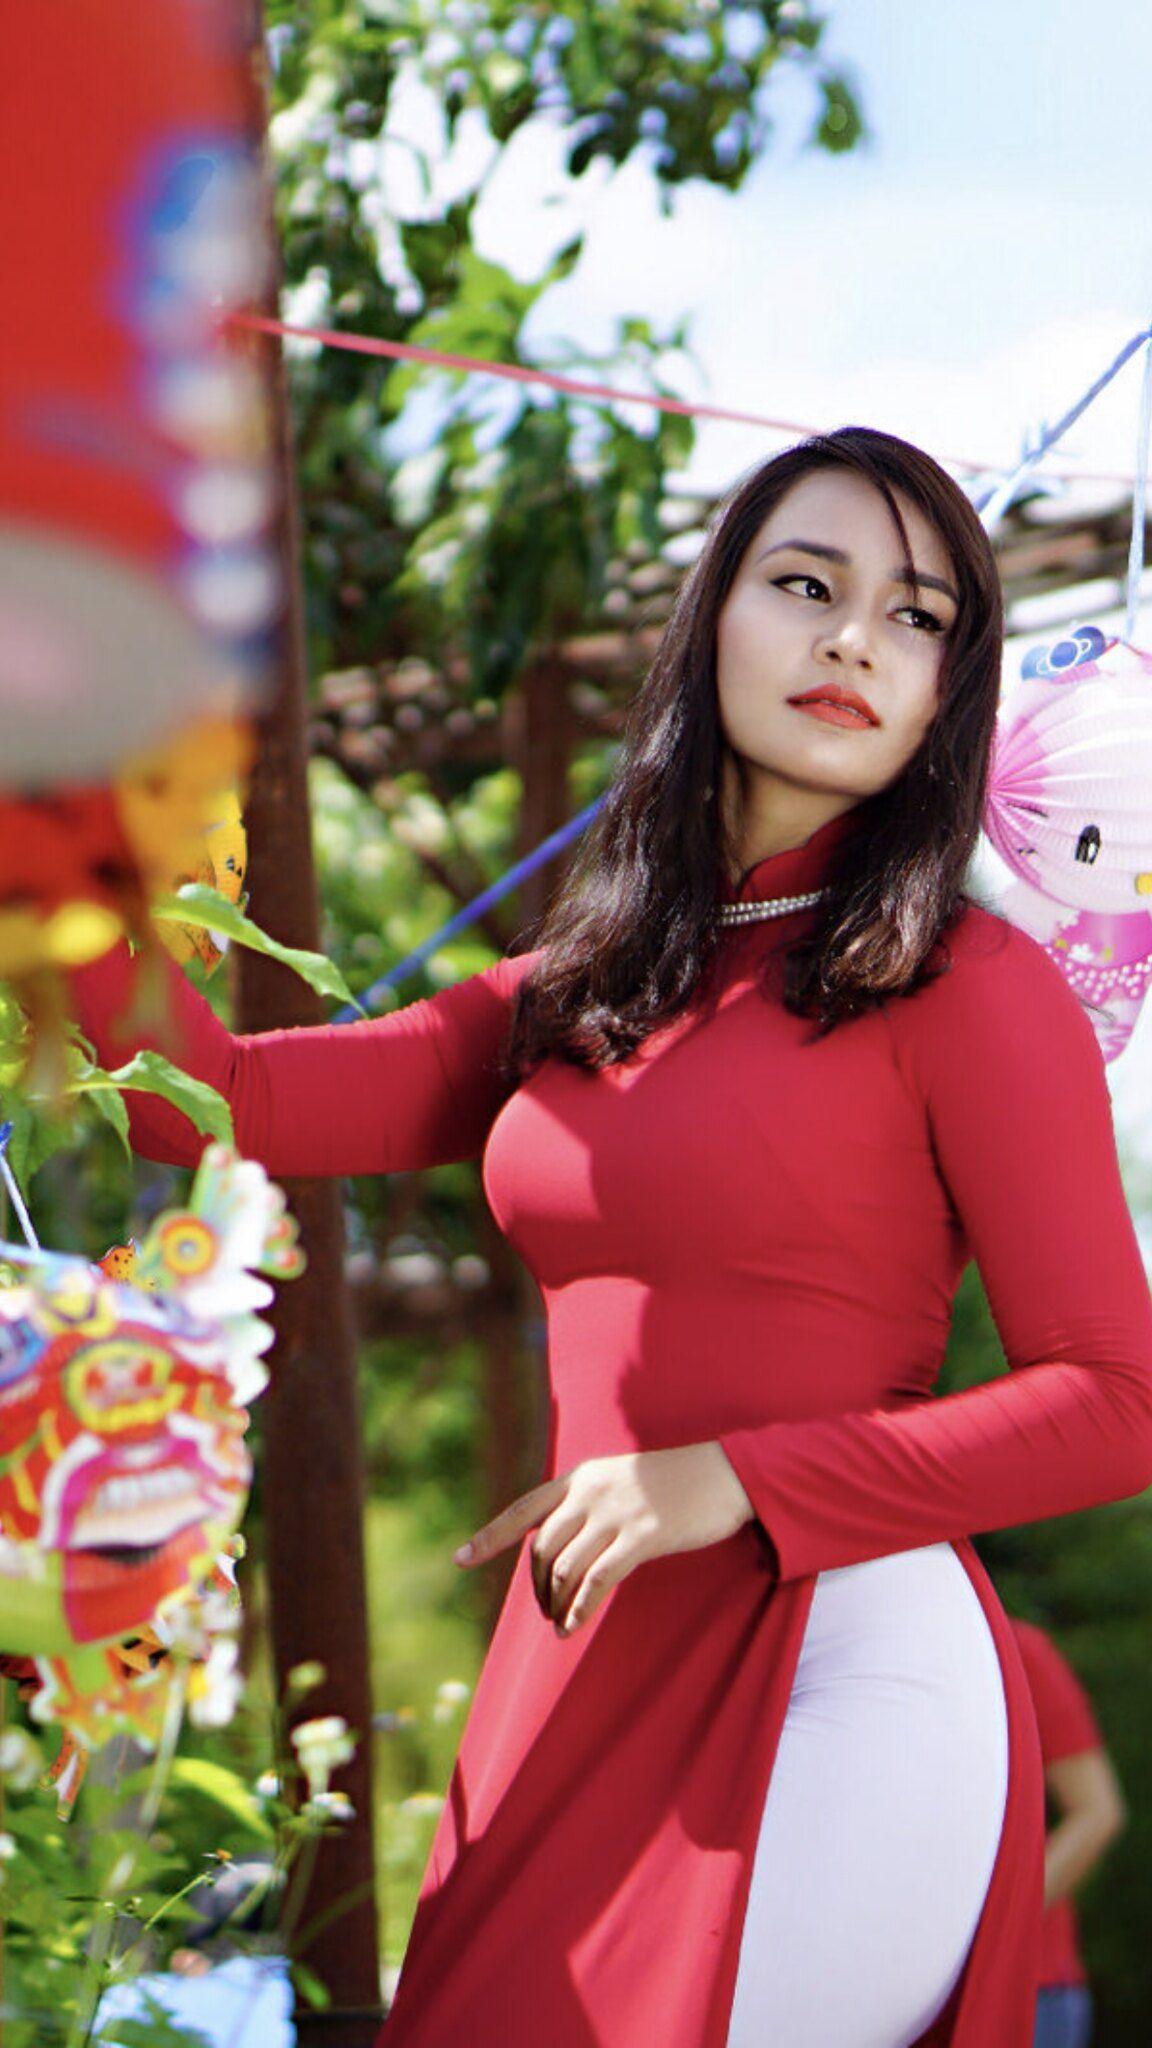 Pin by Hermis Chacko on mahi in 2020 | Desi beauty, Asian